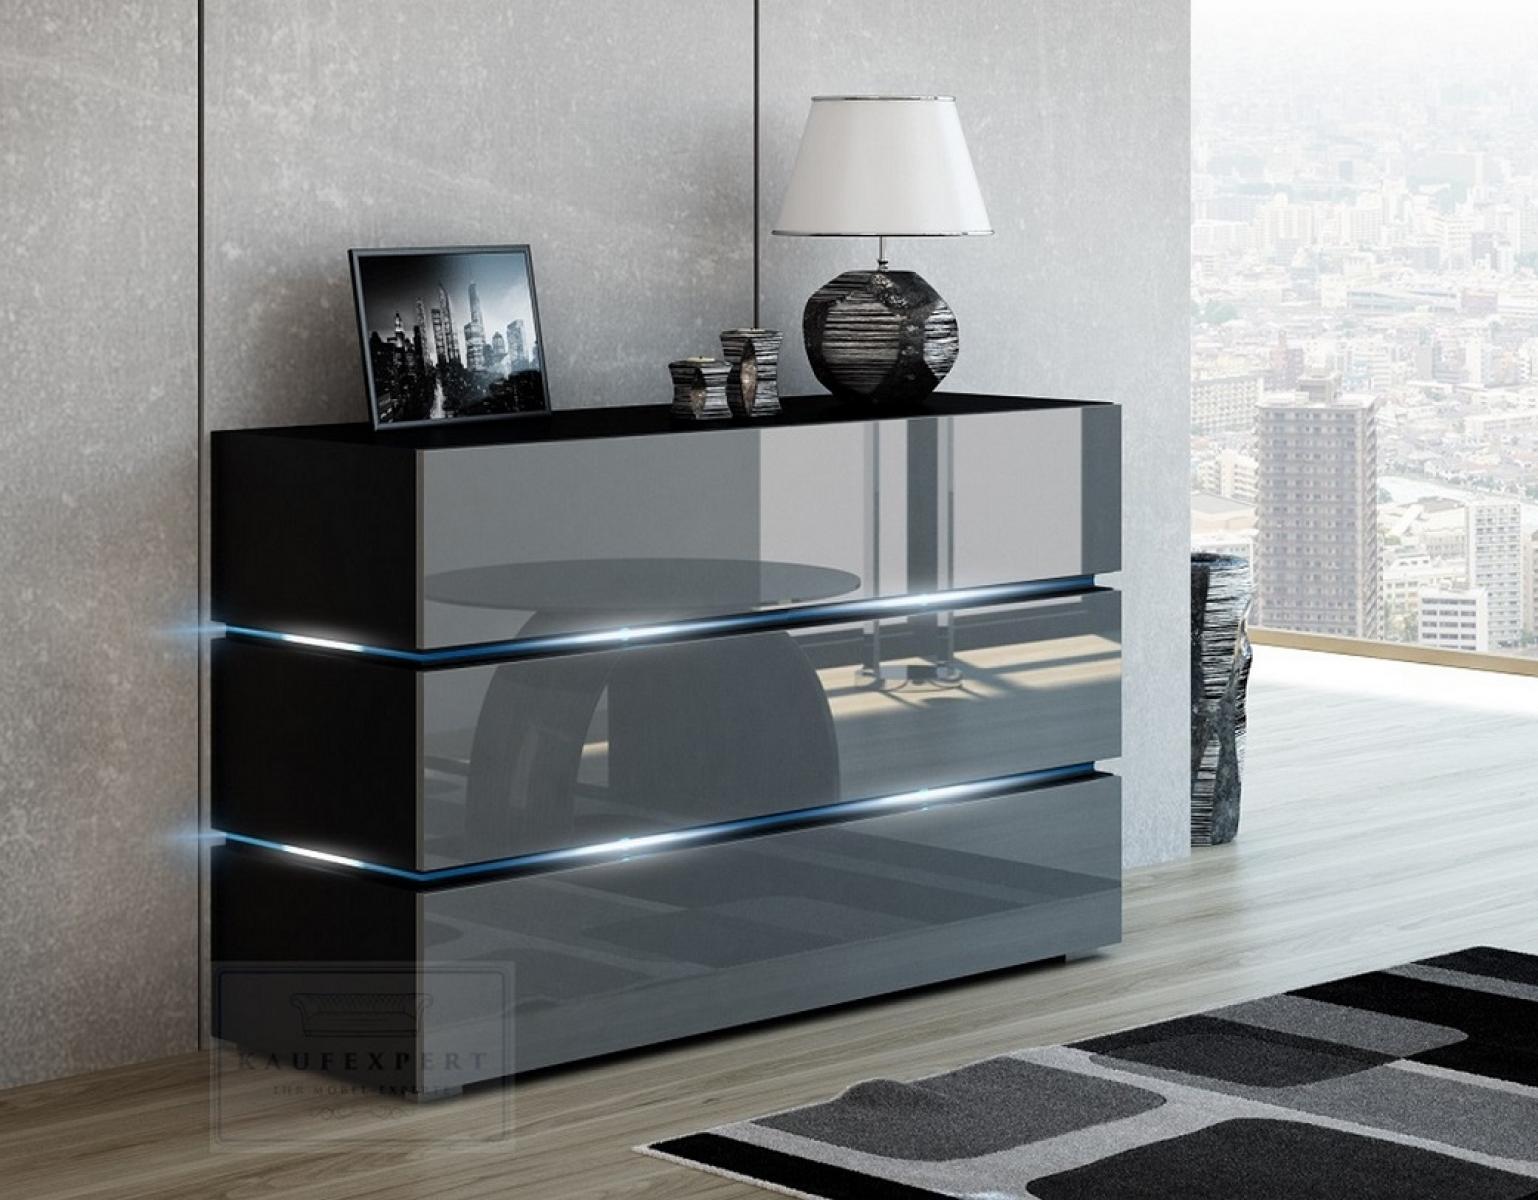 Kaufexpert Kommode Shine Sideboard 120 Cm Grau Hochglanzschwarz